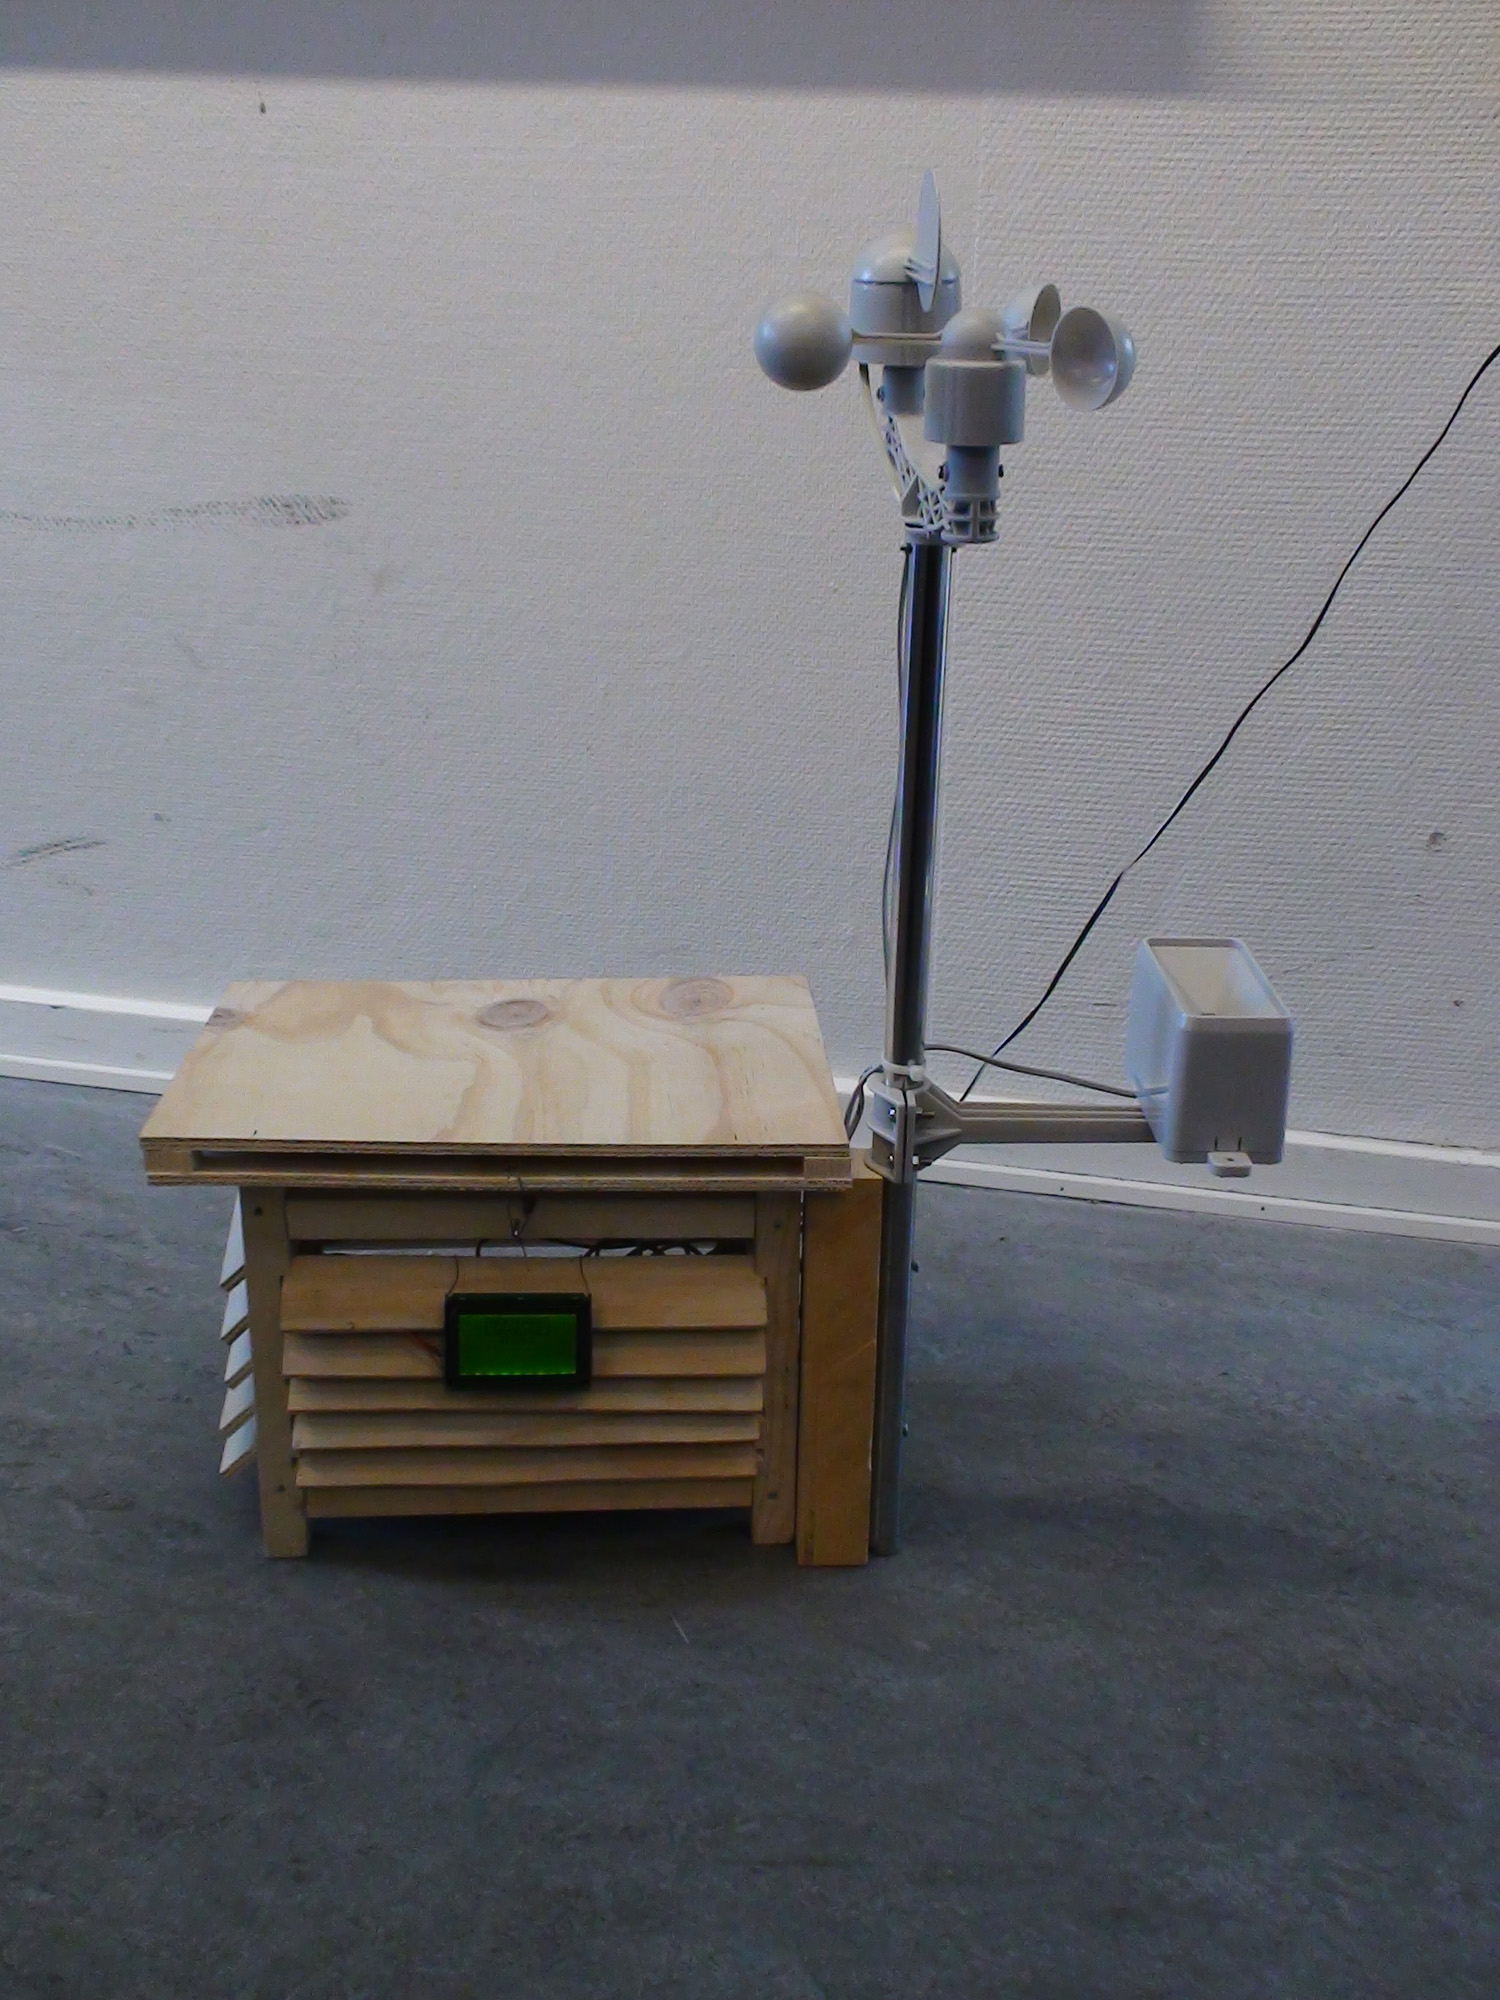 Tkj electronics arduino weather station school project